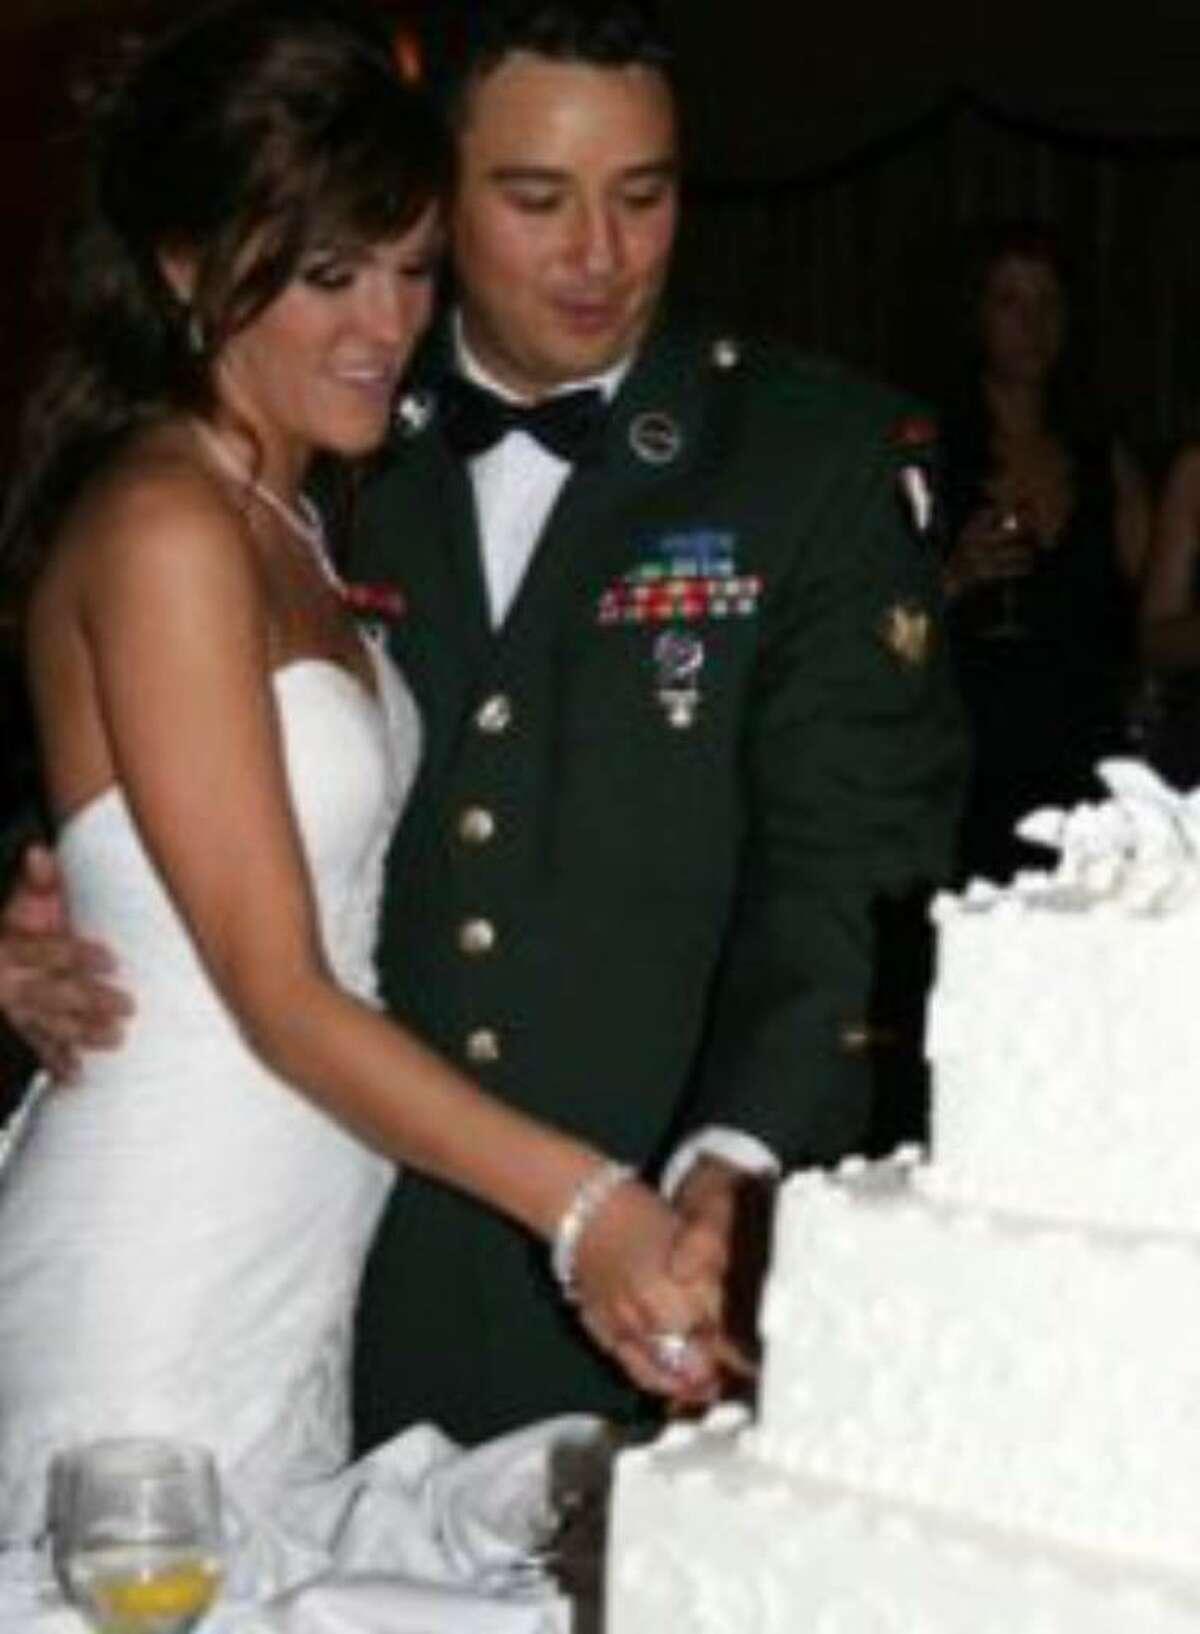 Spc. Benjamin D. Osborn and his wife, Nicole Lapier- Osborn, on their wedding day in February.